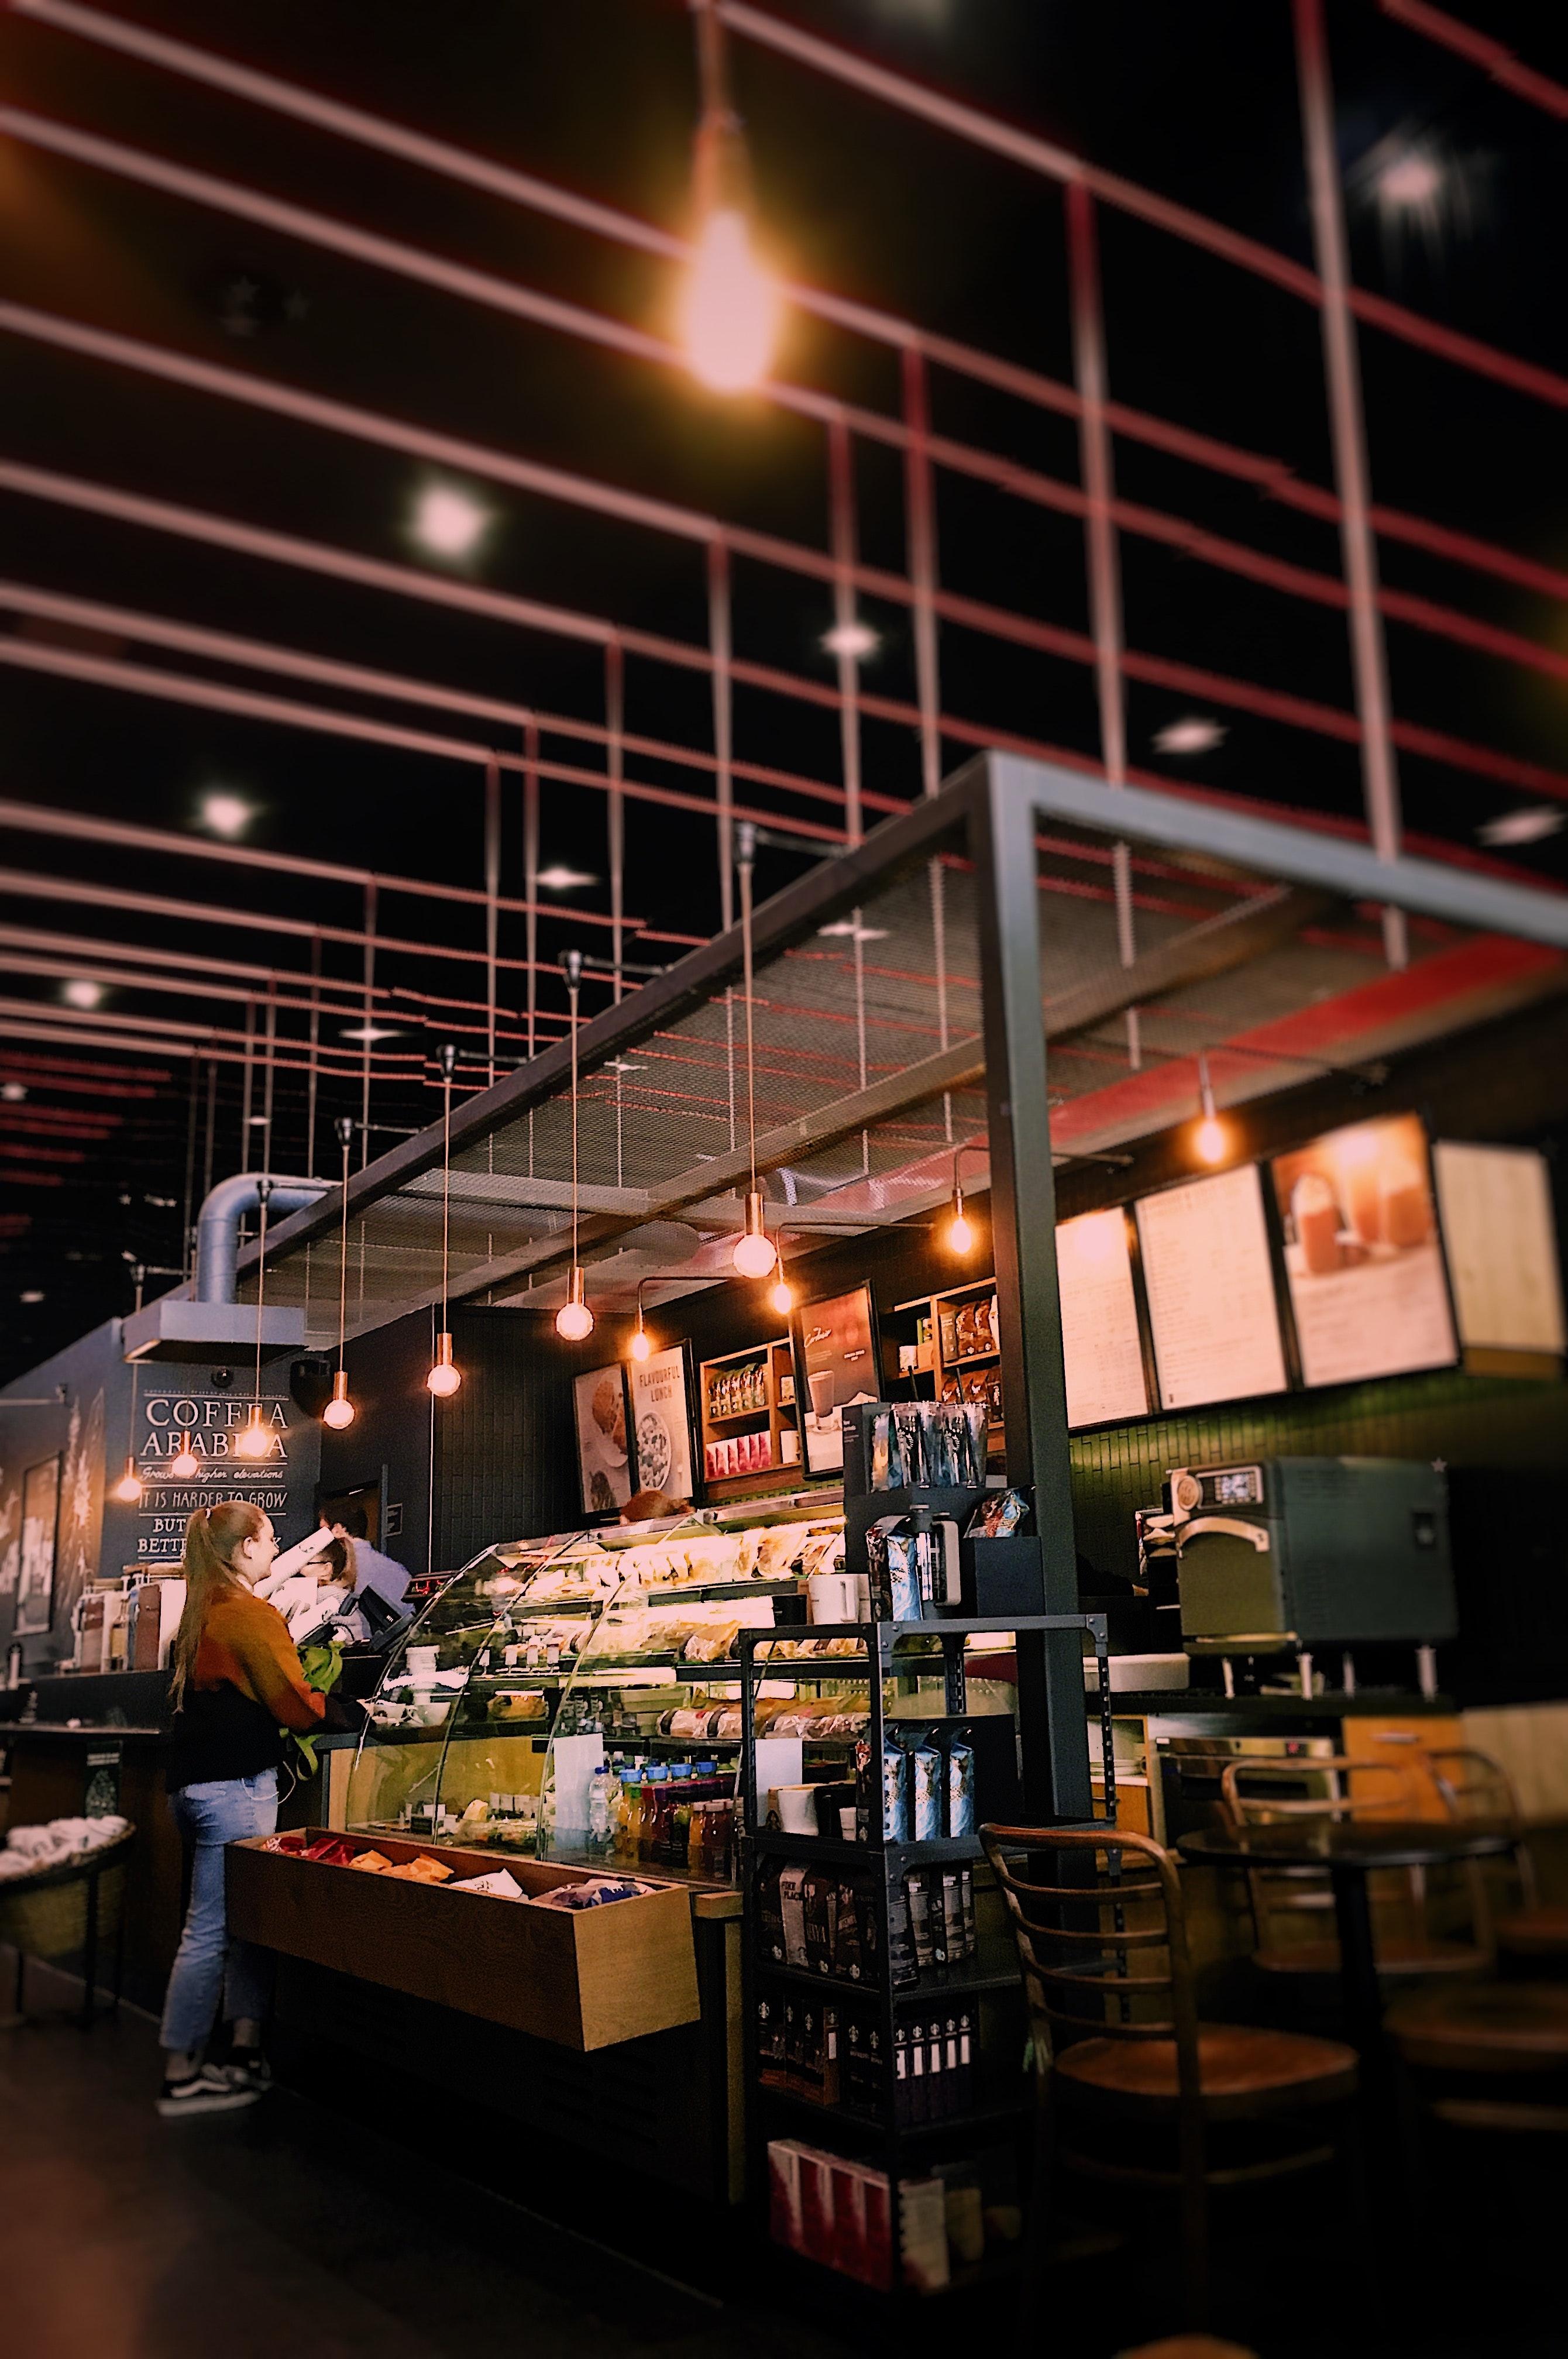 FREE IMAGES RESTAURANT LIGHTING INTERIOR DESIGN CAFE NIGHT